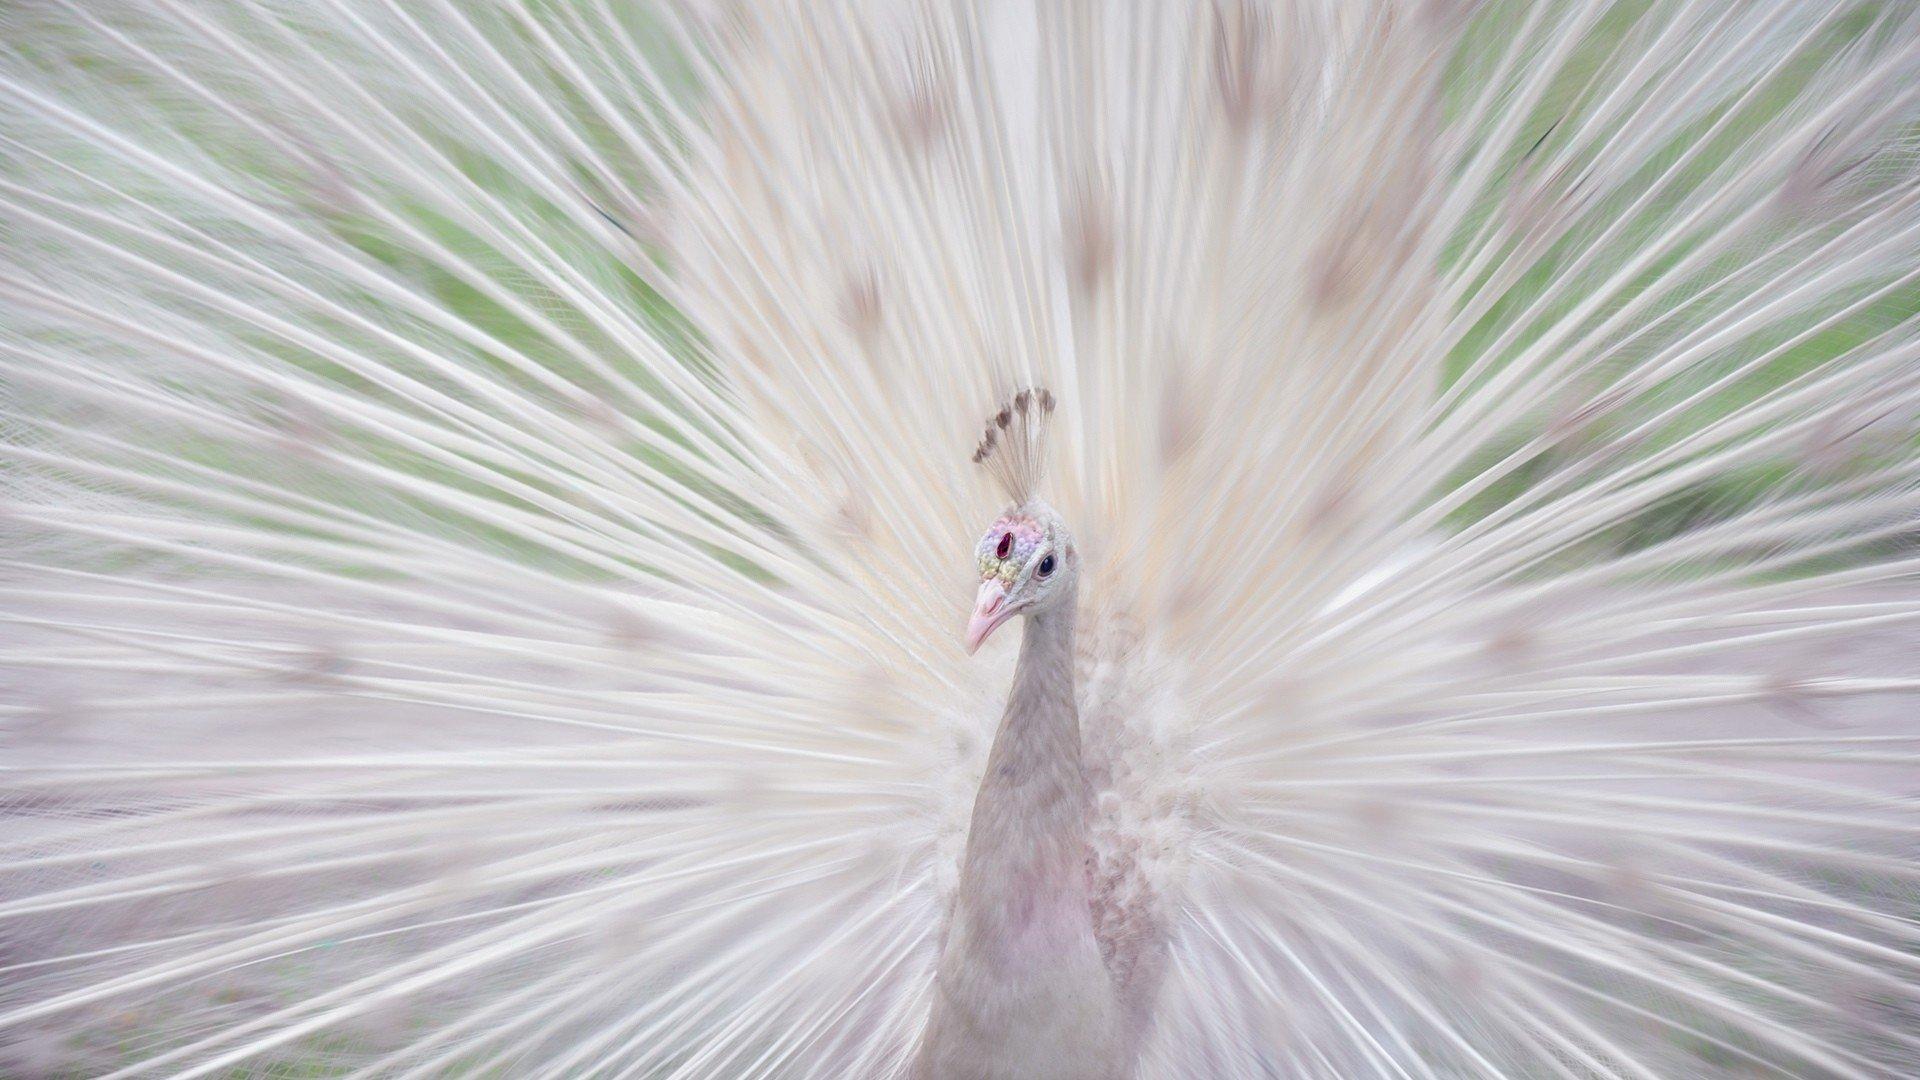 Download Full Hd Peacock Computer Wallpaper Id - Albino Animal , HD Wallpaper & Backgrounds